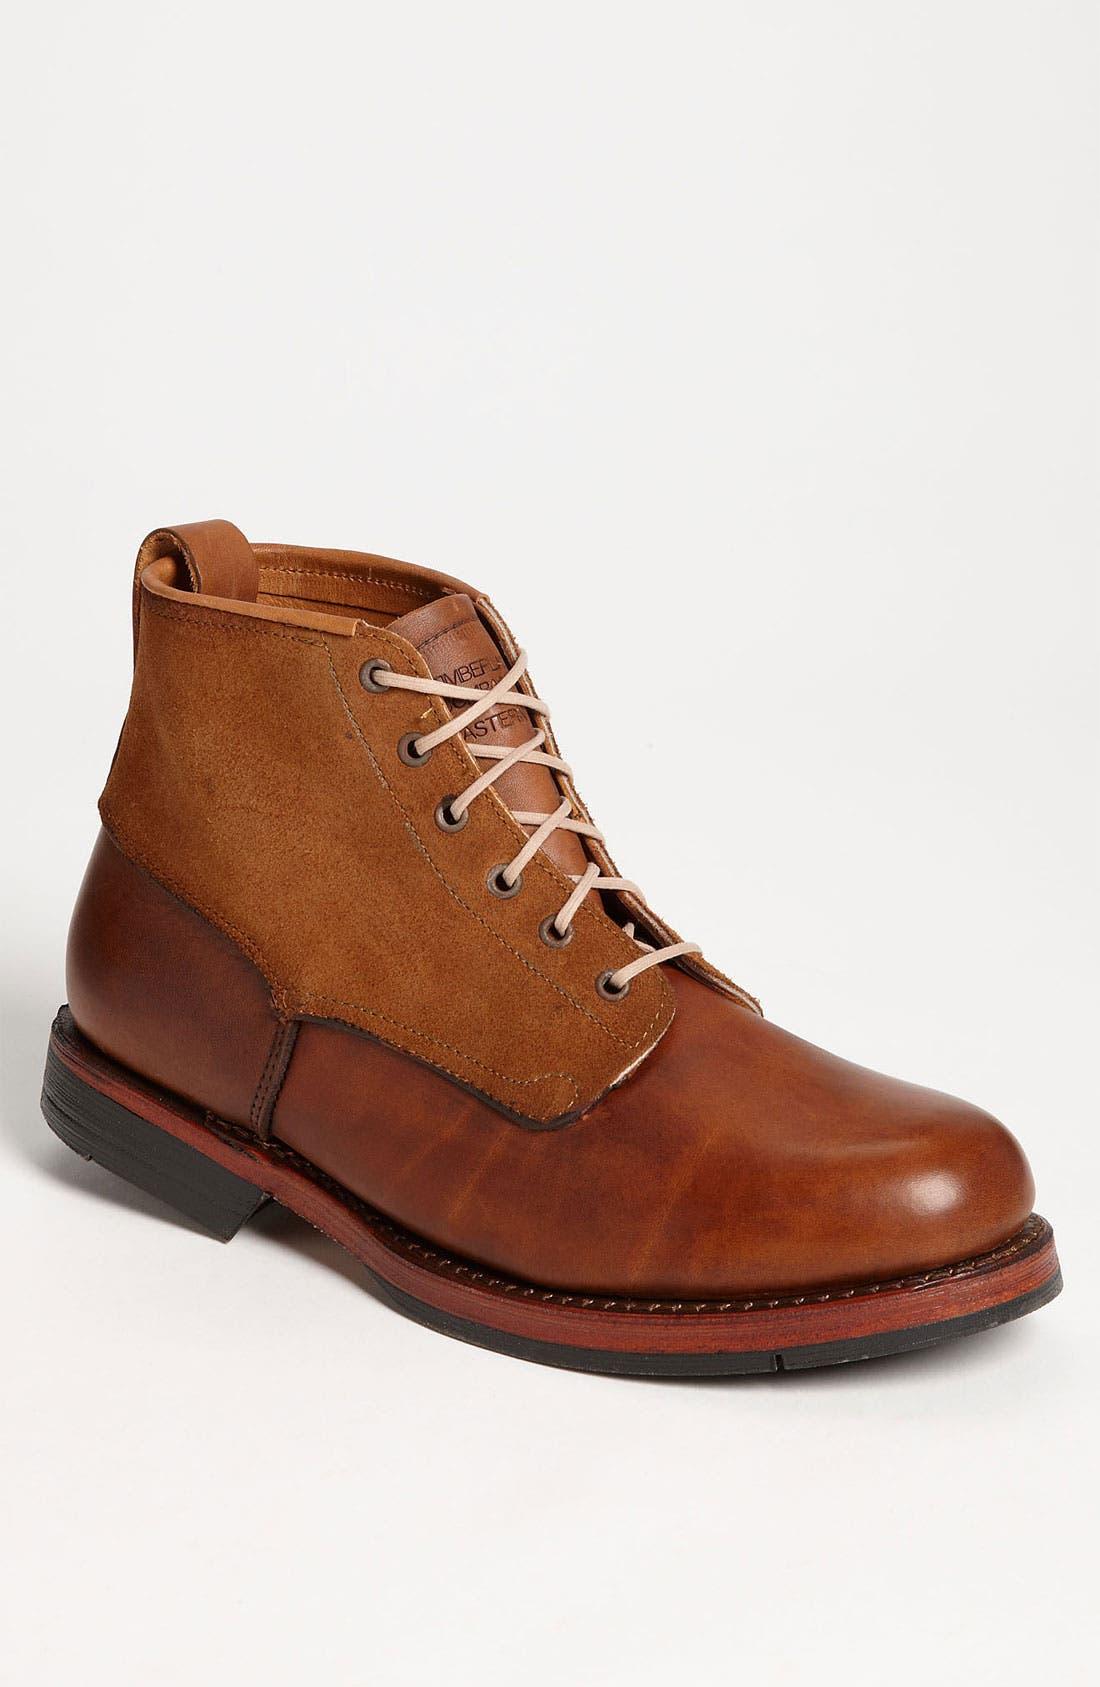 Alternate Image 1 Selected - Timberland 'Eastern Standard' Boot